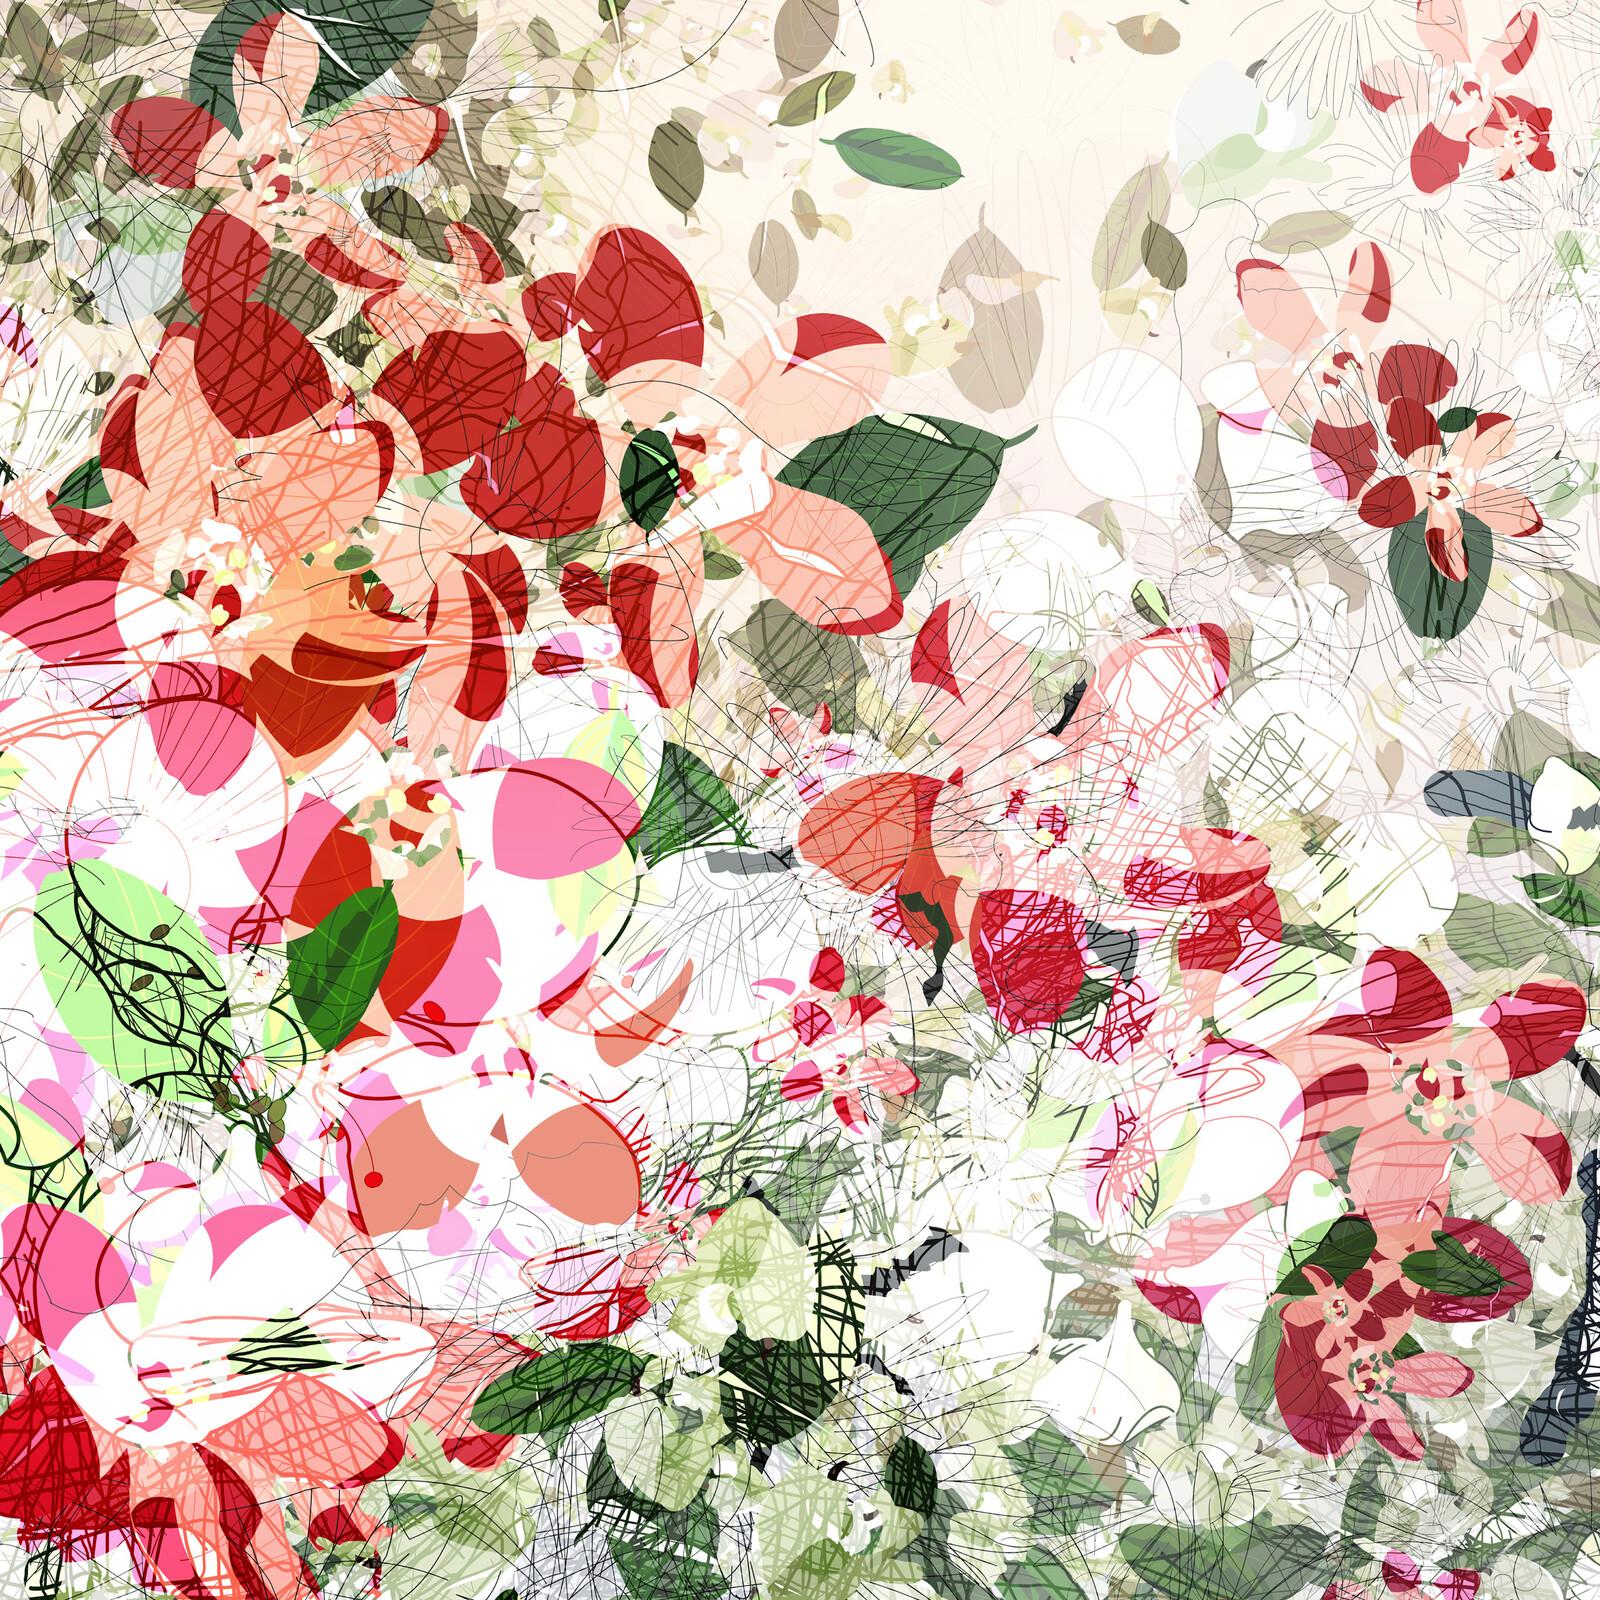 peach blossom christine jaschek pictures photography photo art online at lumas. Black Bedroom Furniture Sets. Home Design Ideas